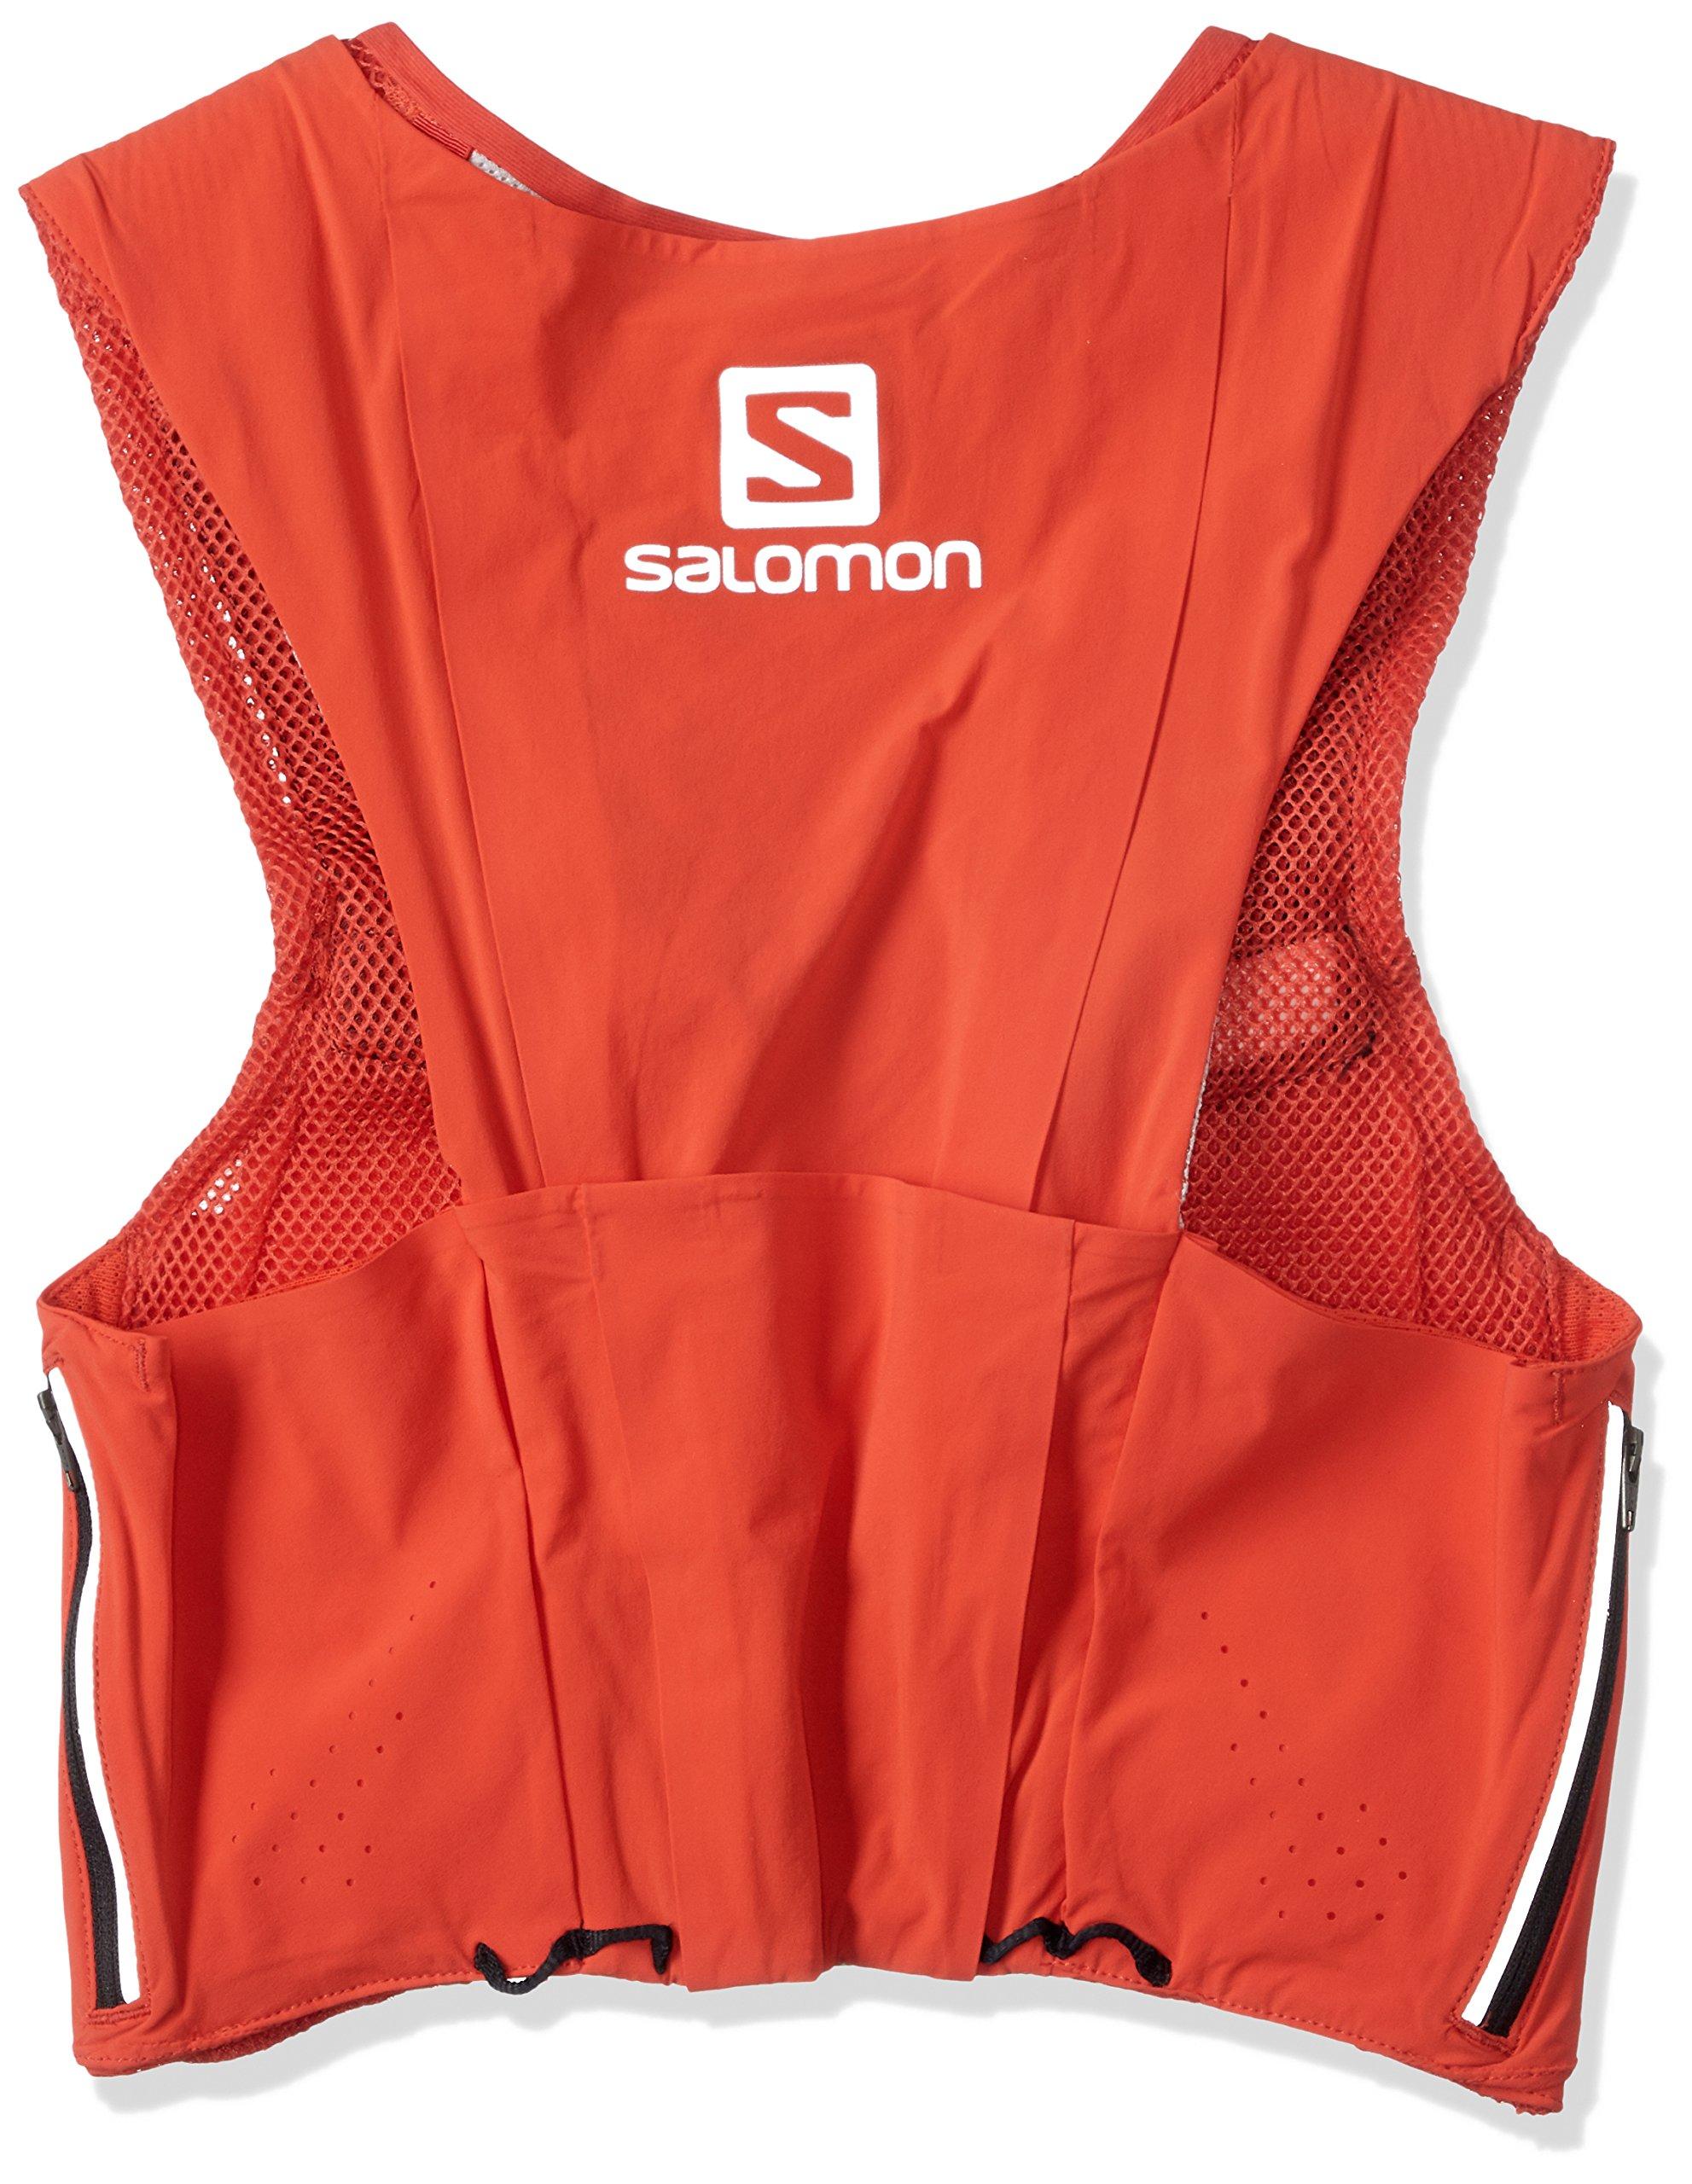 Salomon Unisex S/Lab Sense Ultra 8 Set Hydration Vest, Racing Red, Large by Salomon (Image #2)